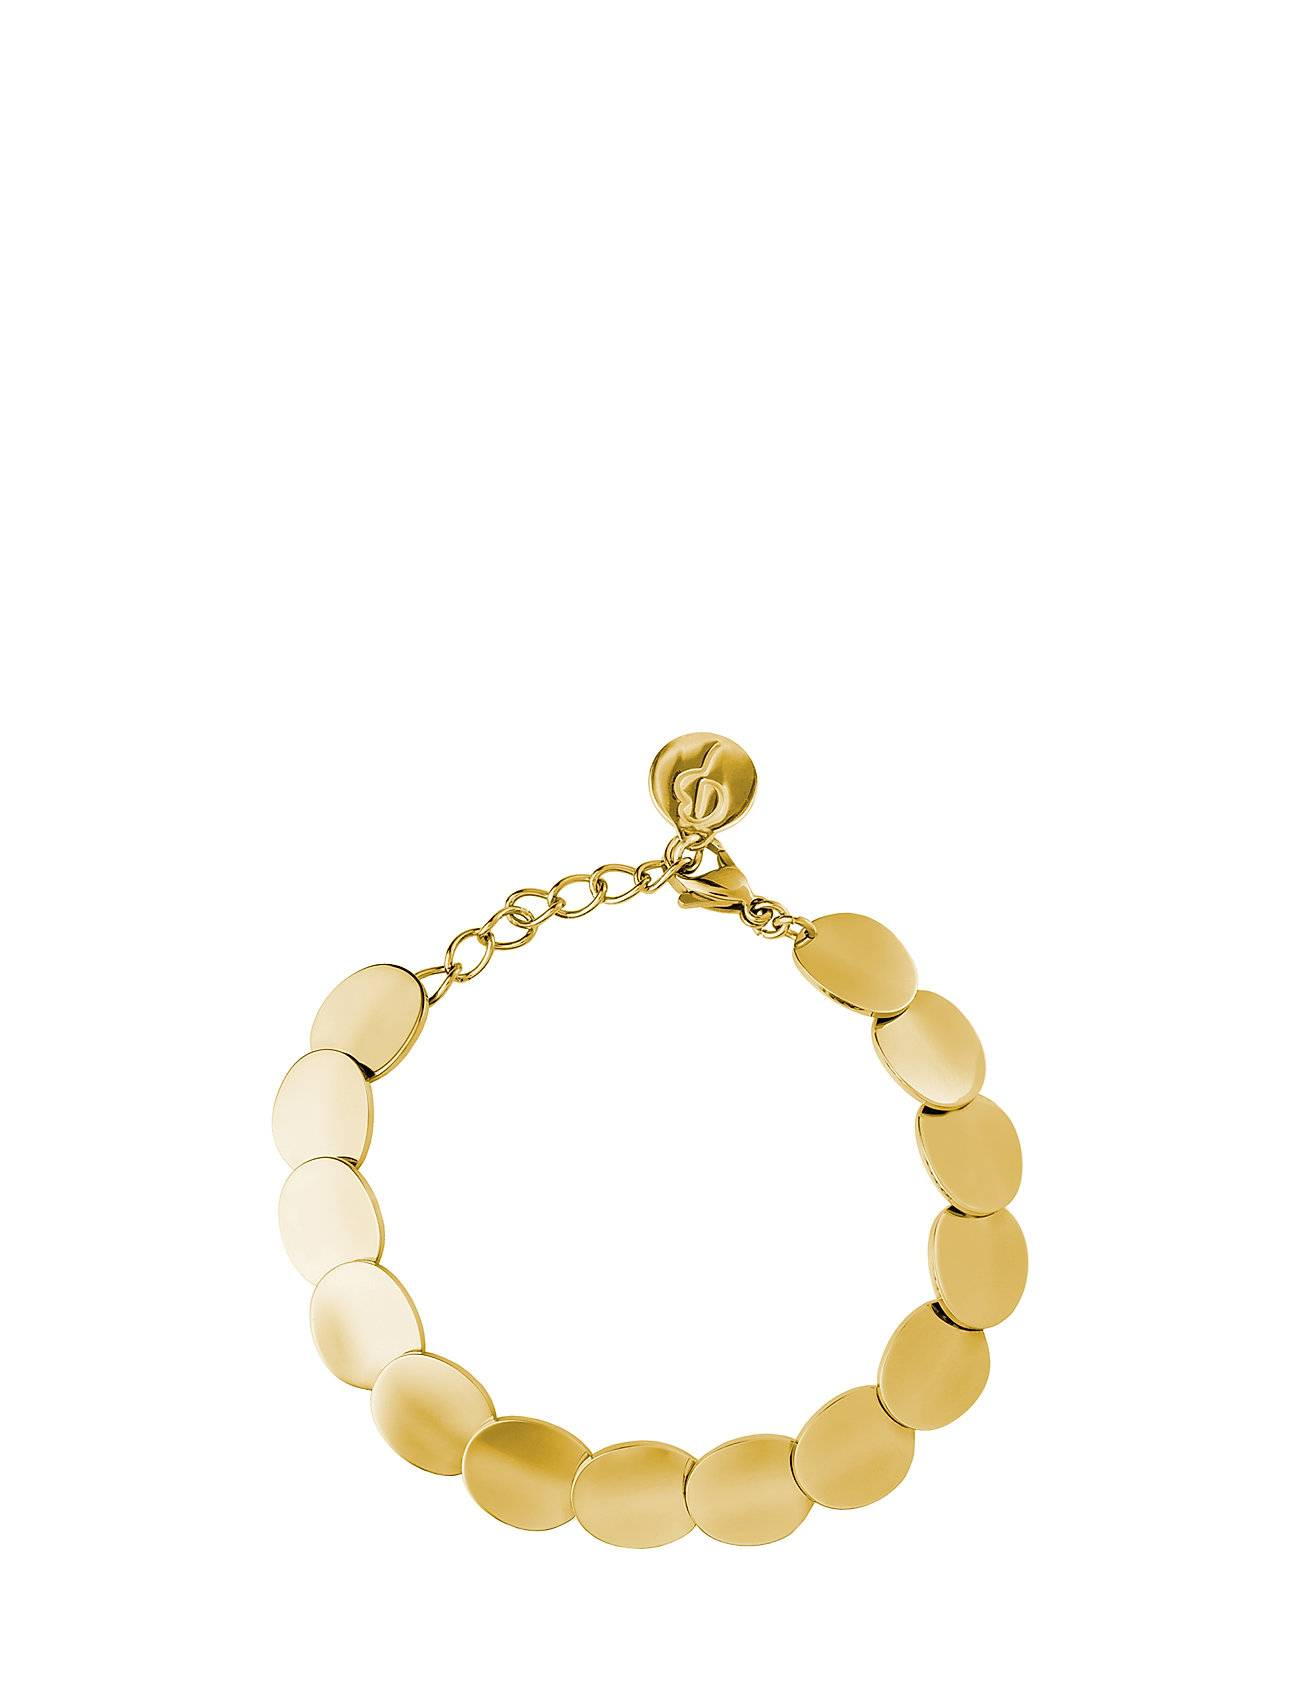 Edblad Pebble Bracelet Gold Accessories Jewellery Bracelets Chain Bracelets Kulta Edblad